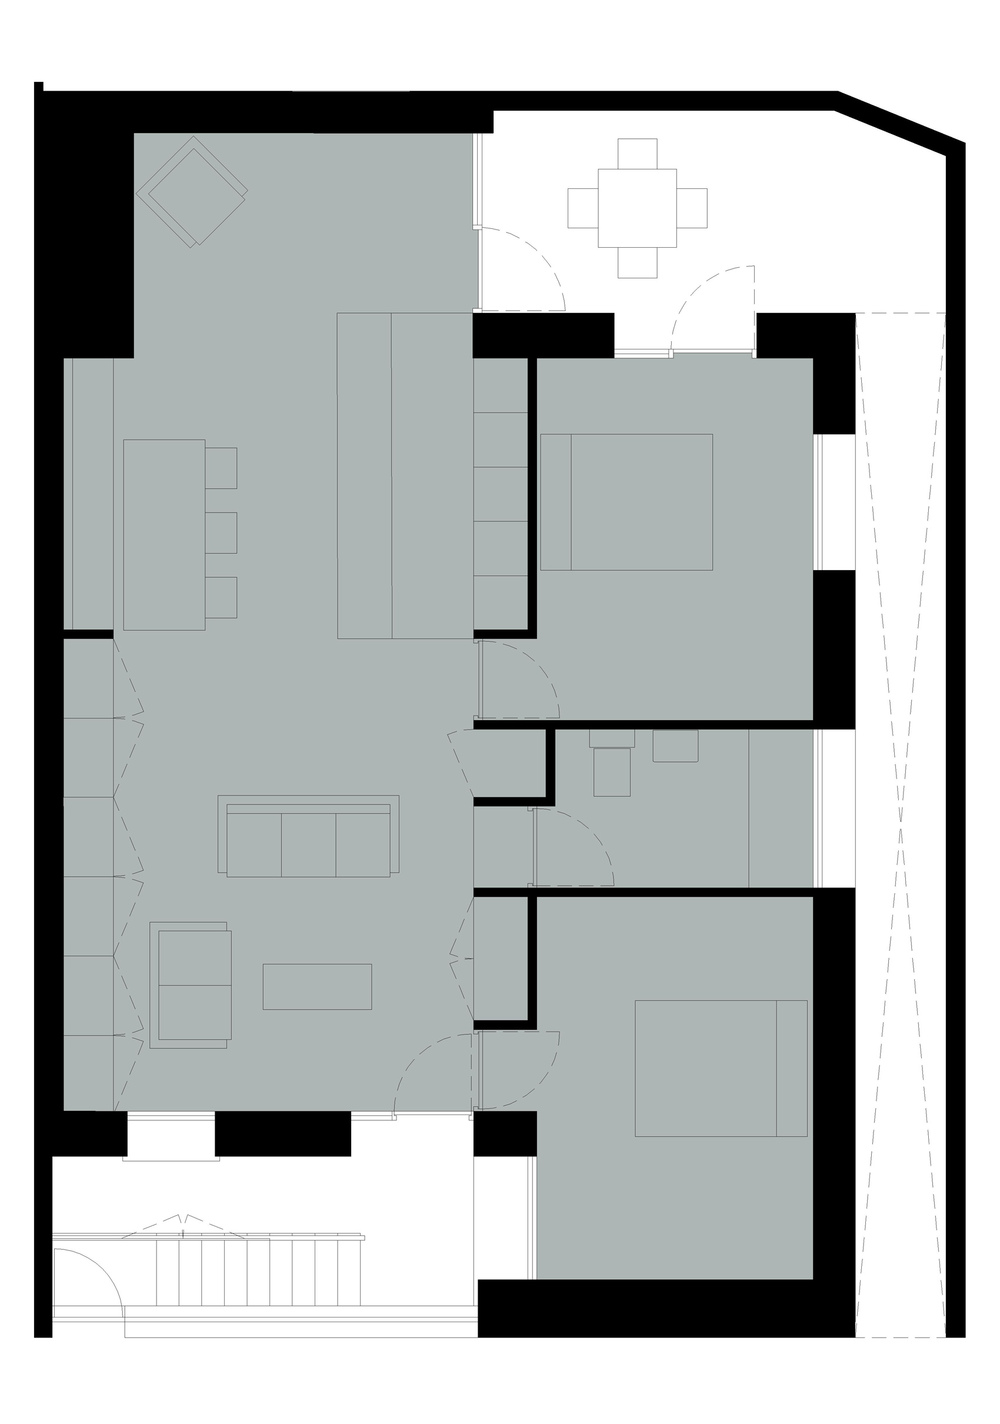 E0728-8-RICHMOND-AVENUE-DESIGN-FLOOR PLAN.jpg